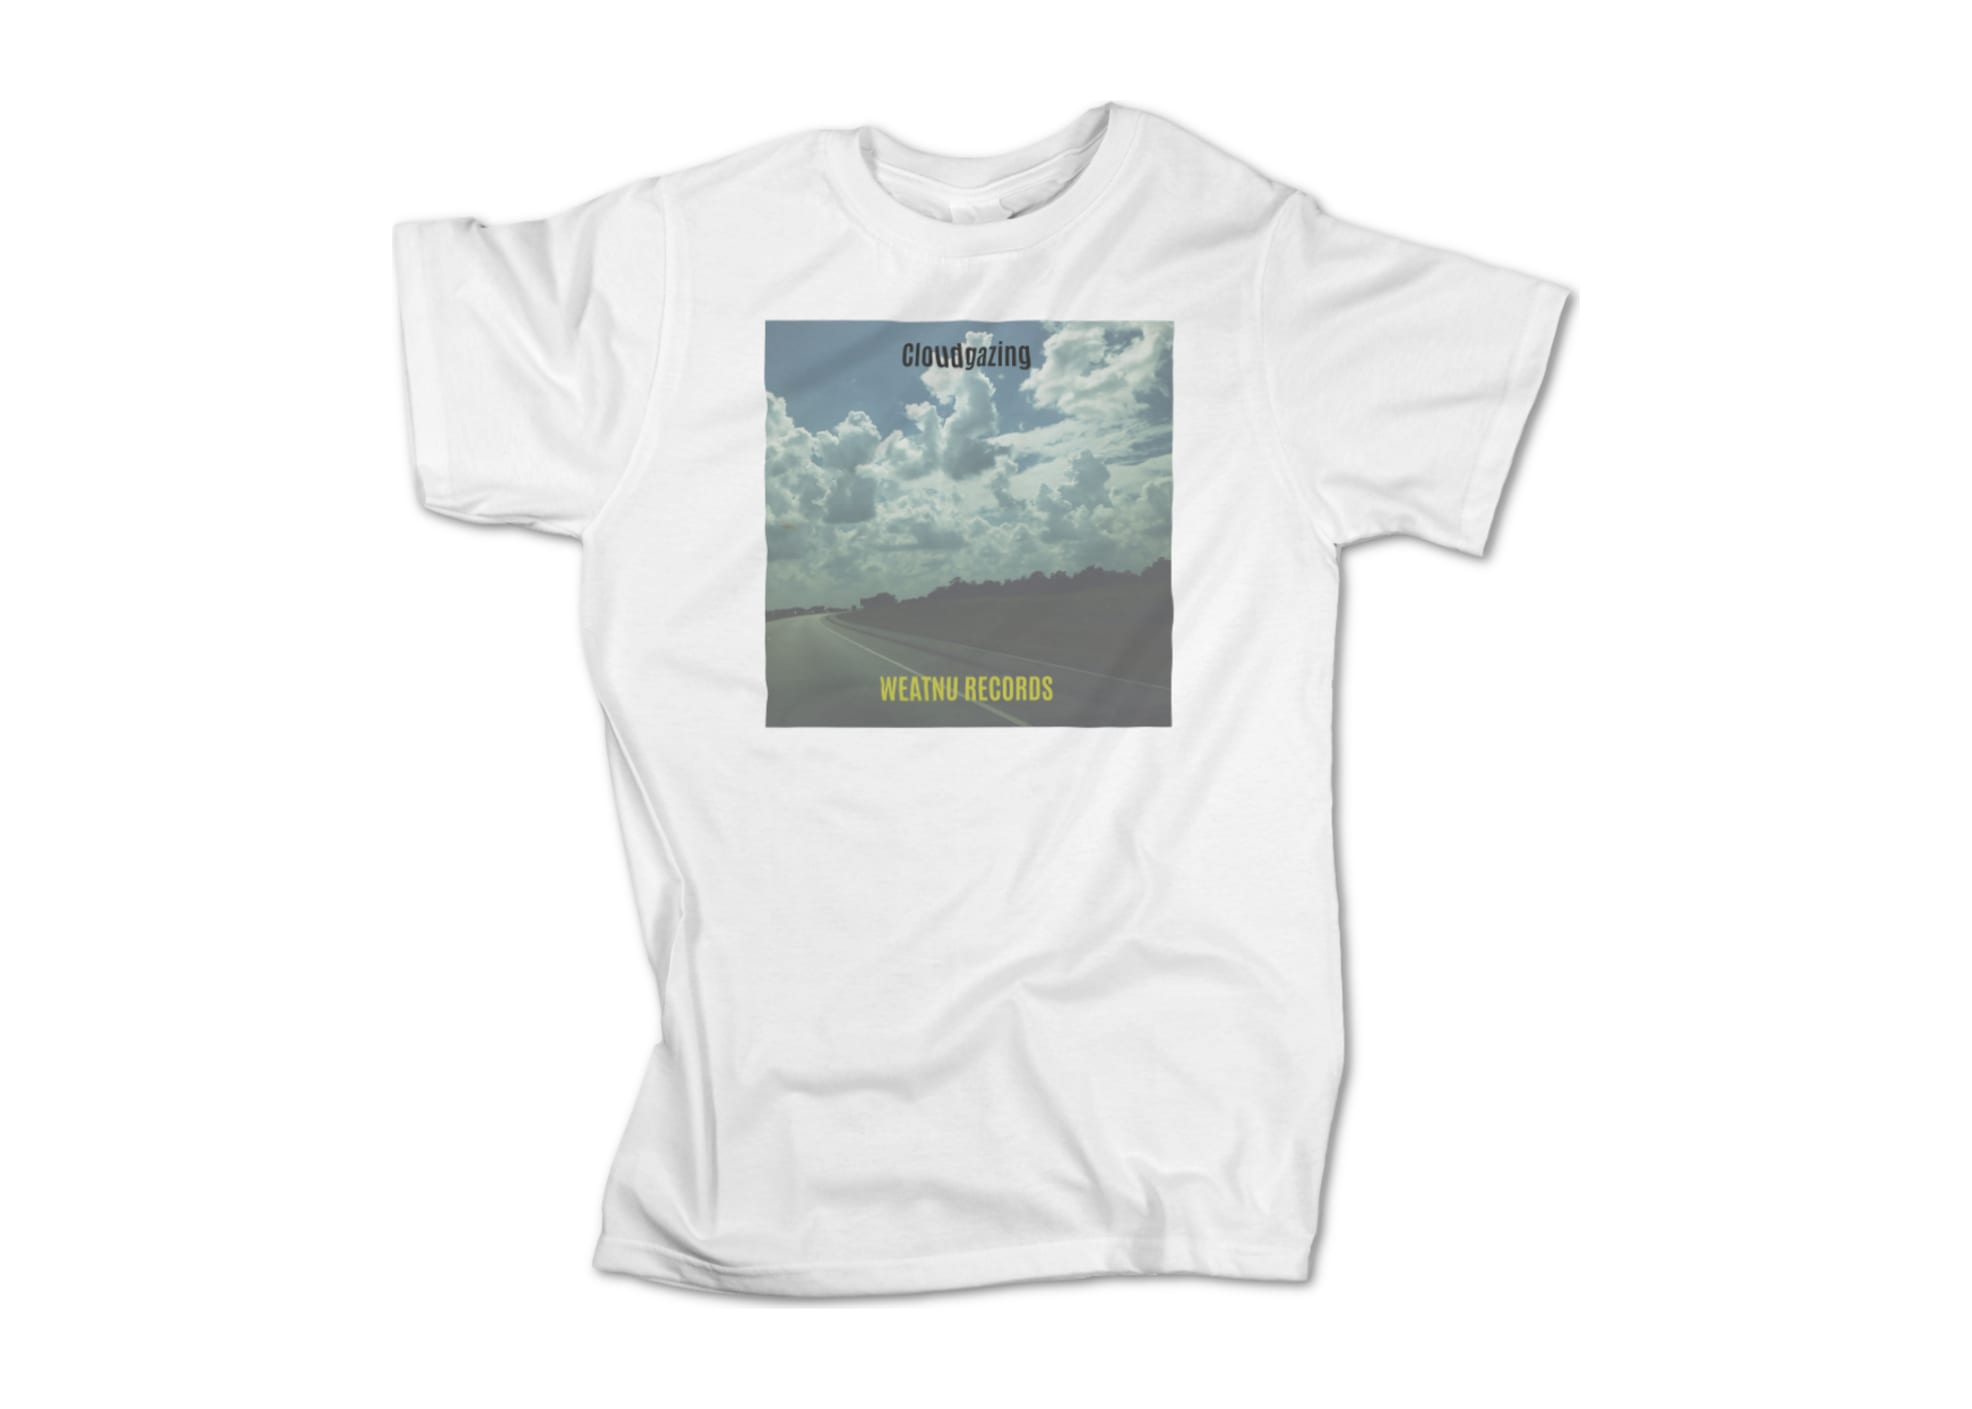 Weatnu records  cloudgazing by weatnu records  1534394821